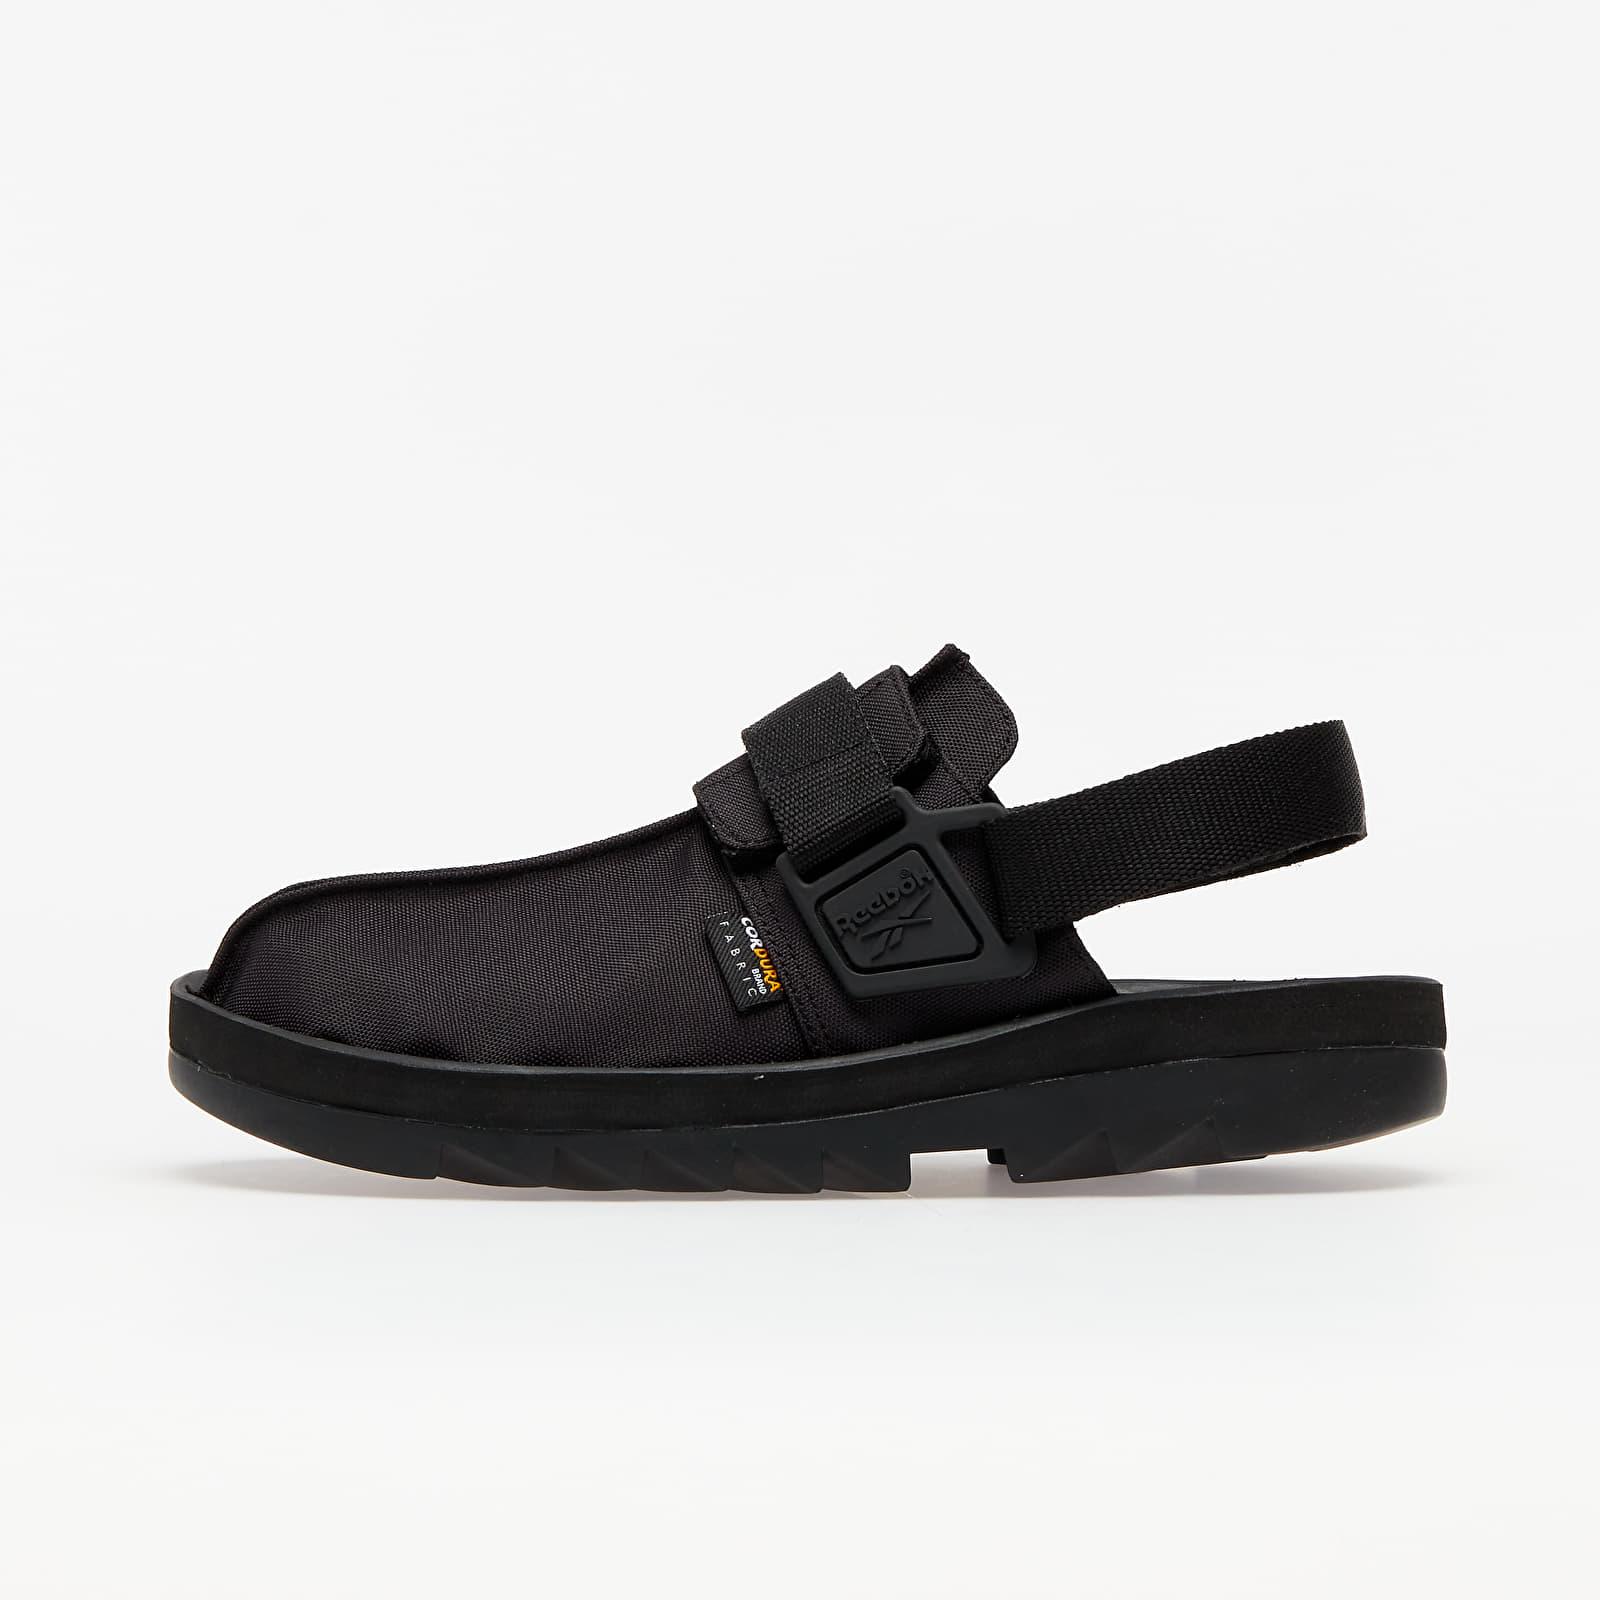 Men's shoes Reebok Beatnik Black/ Black/ Black